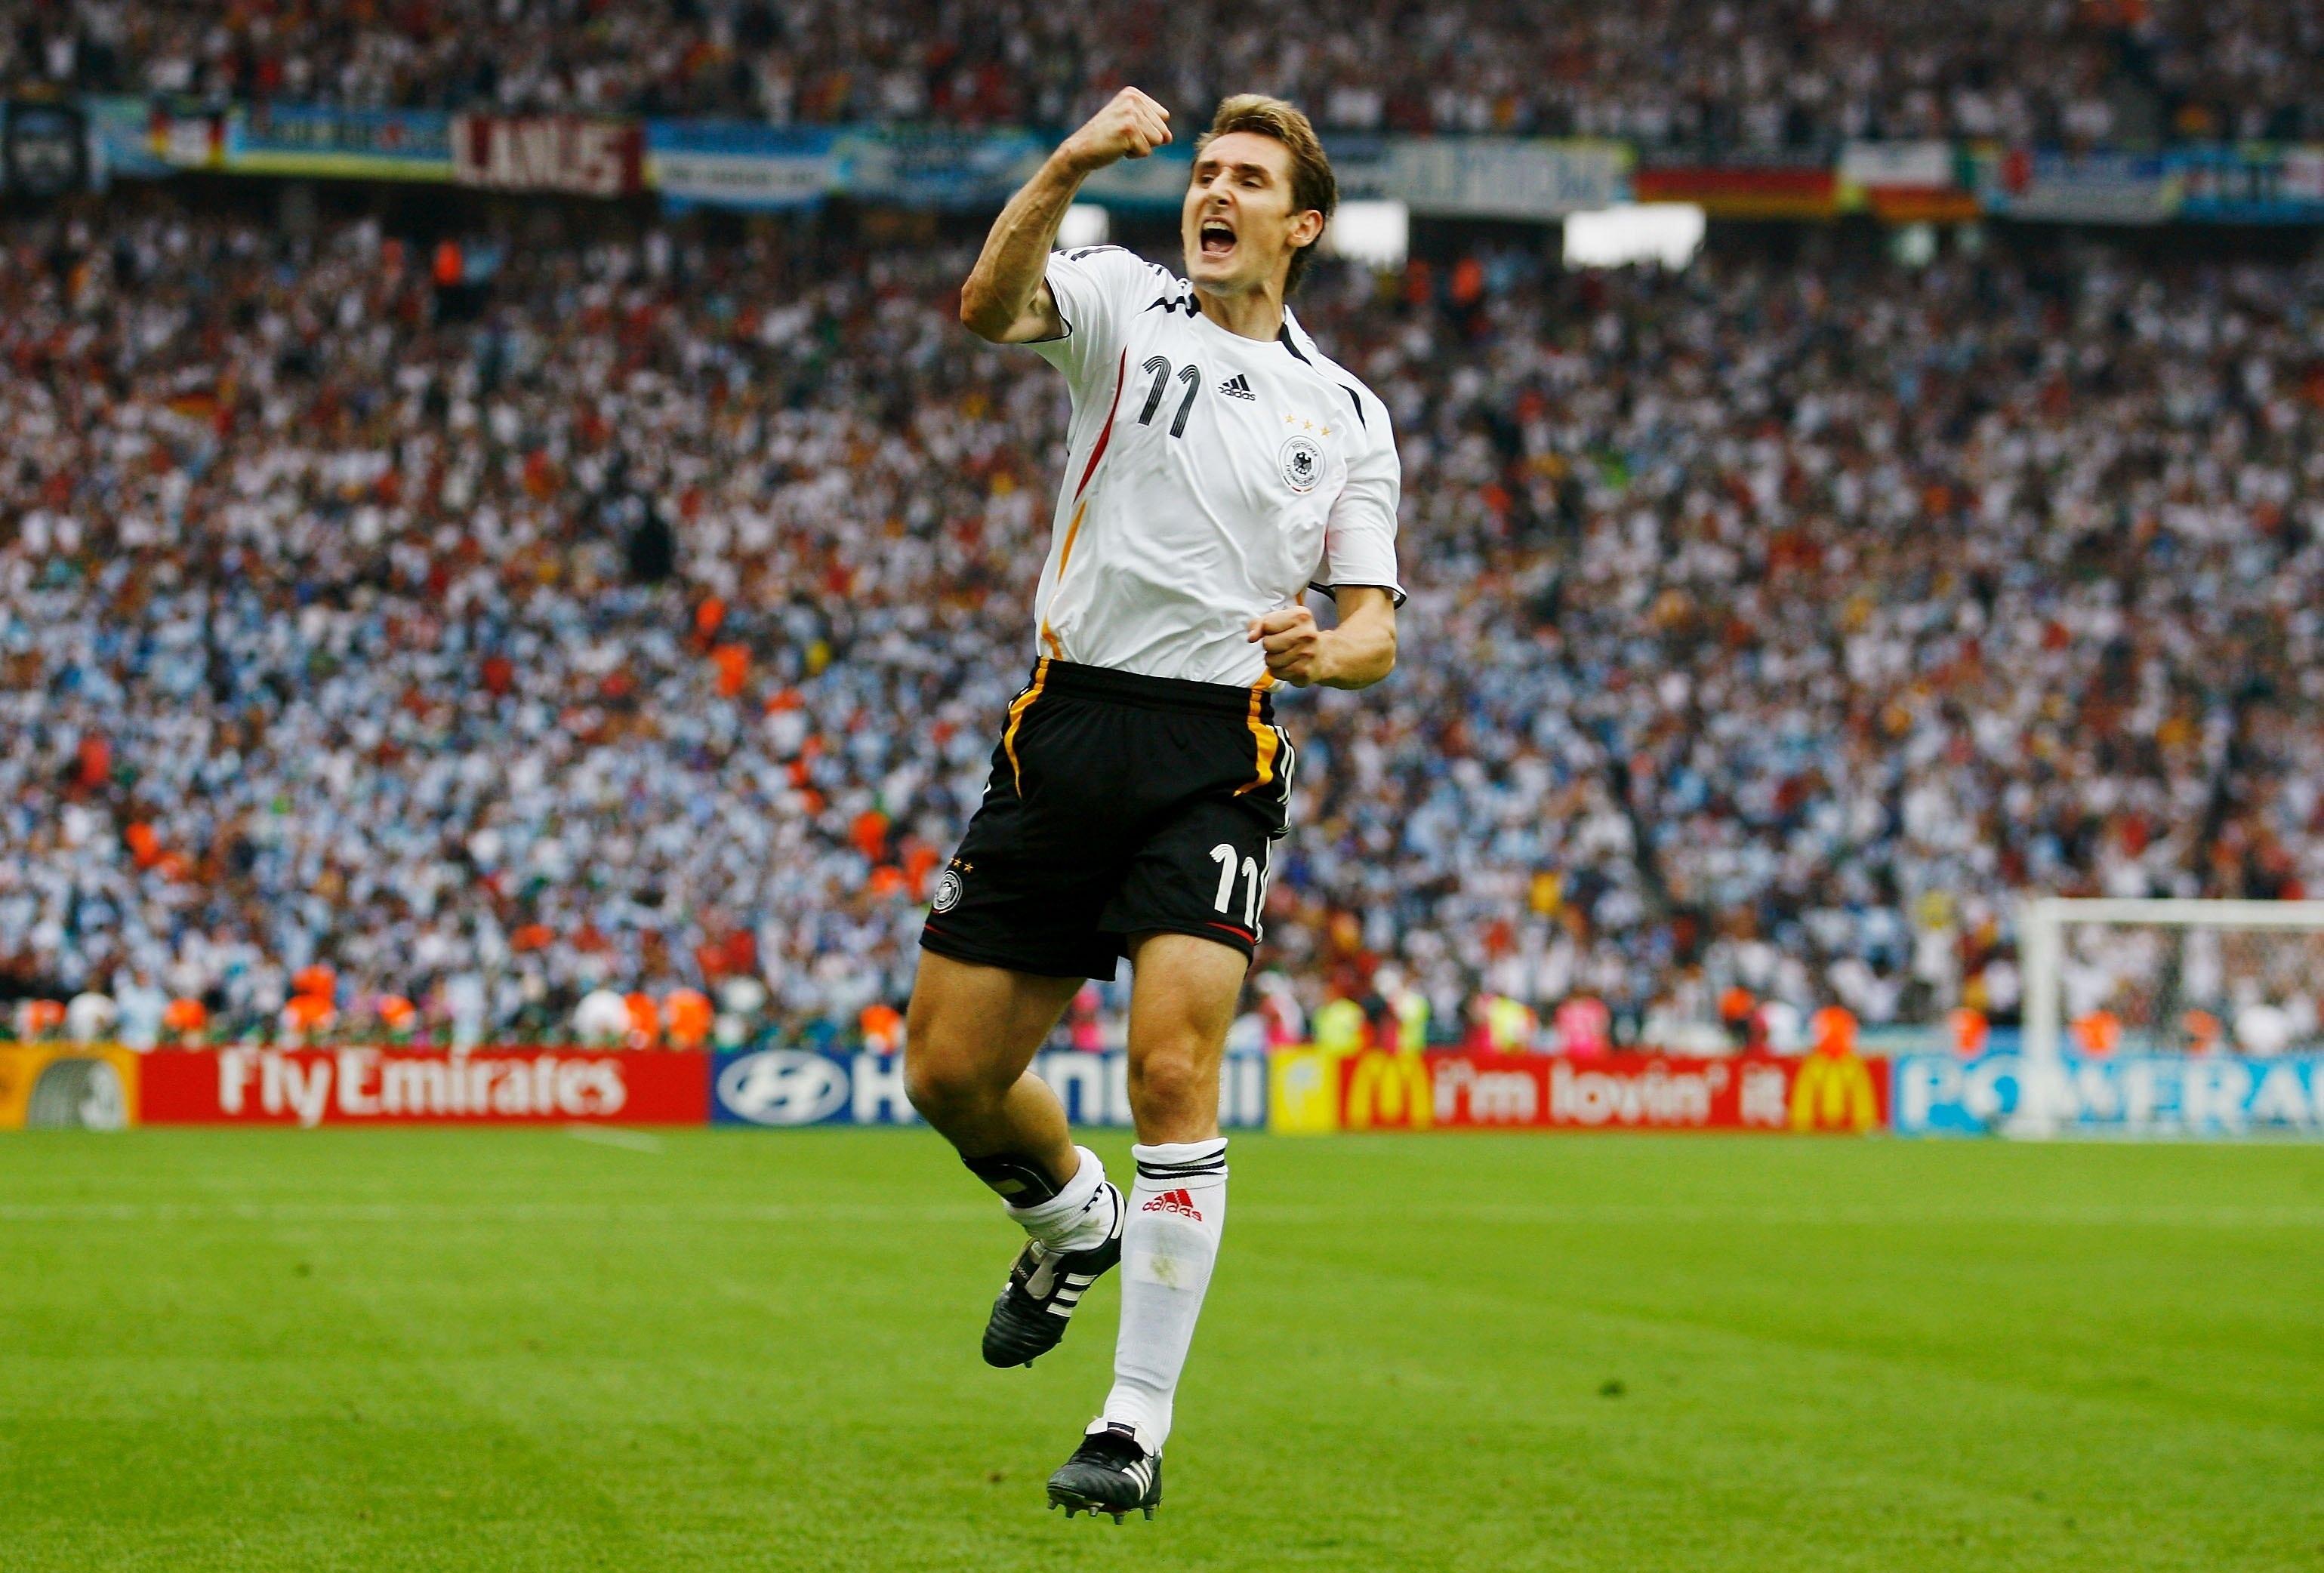 Miroslav Klose Wallpapers - Digital HD Photos